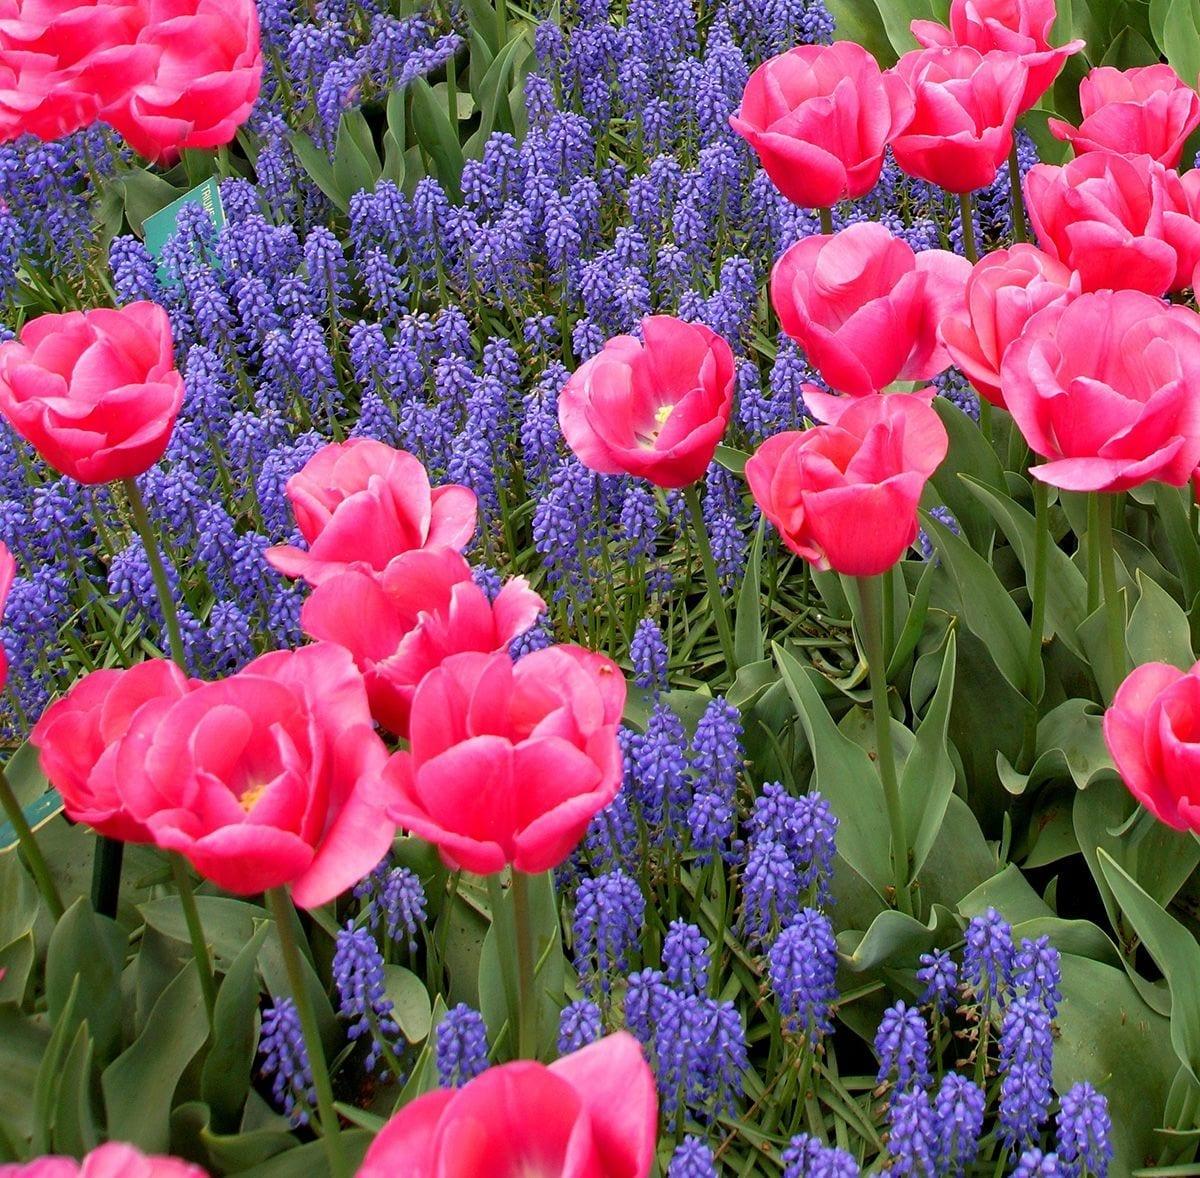 Pink Tulips and Purple Muscari Spring Flowering Bulbs